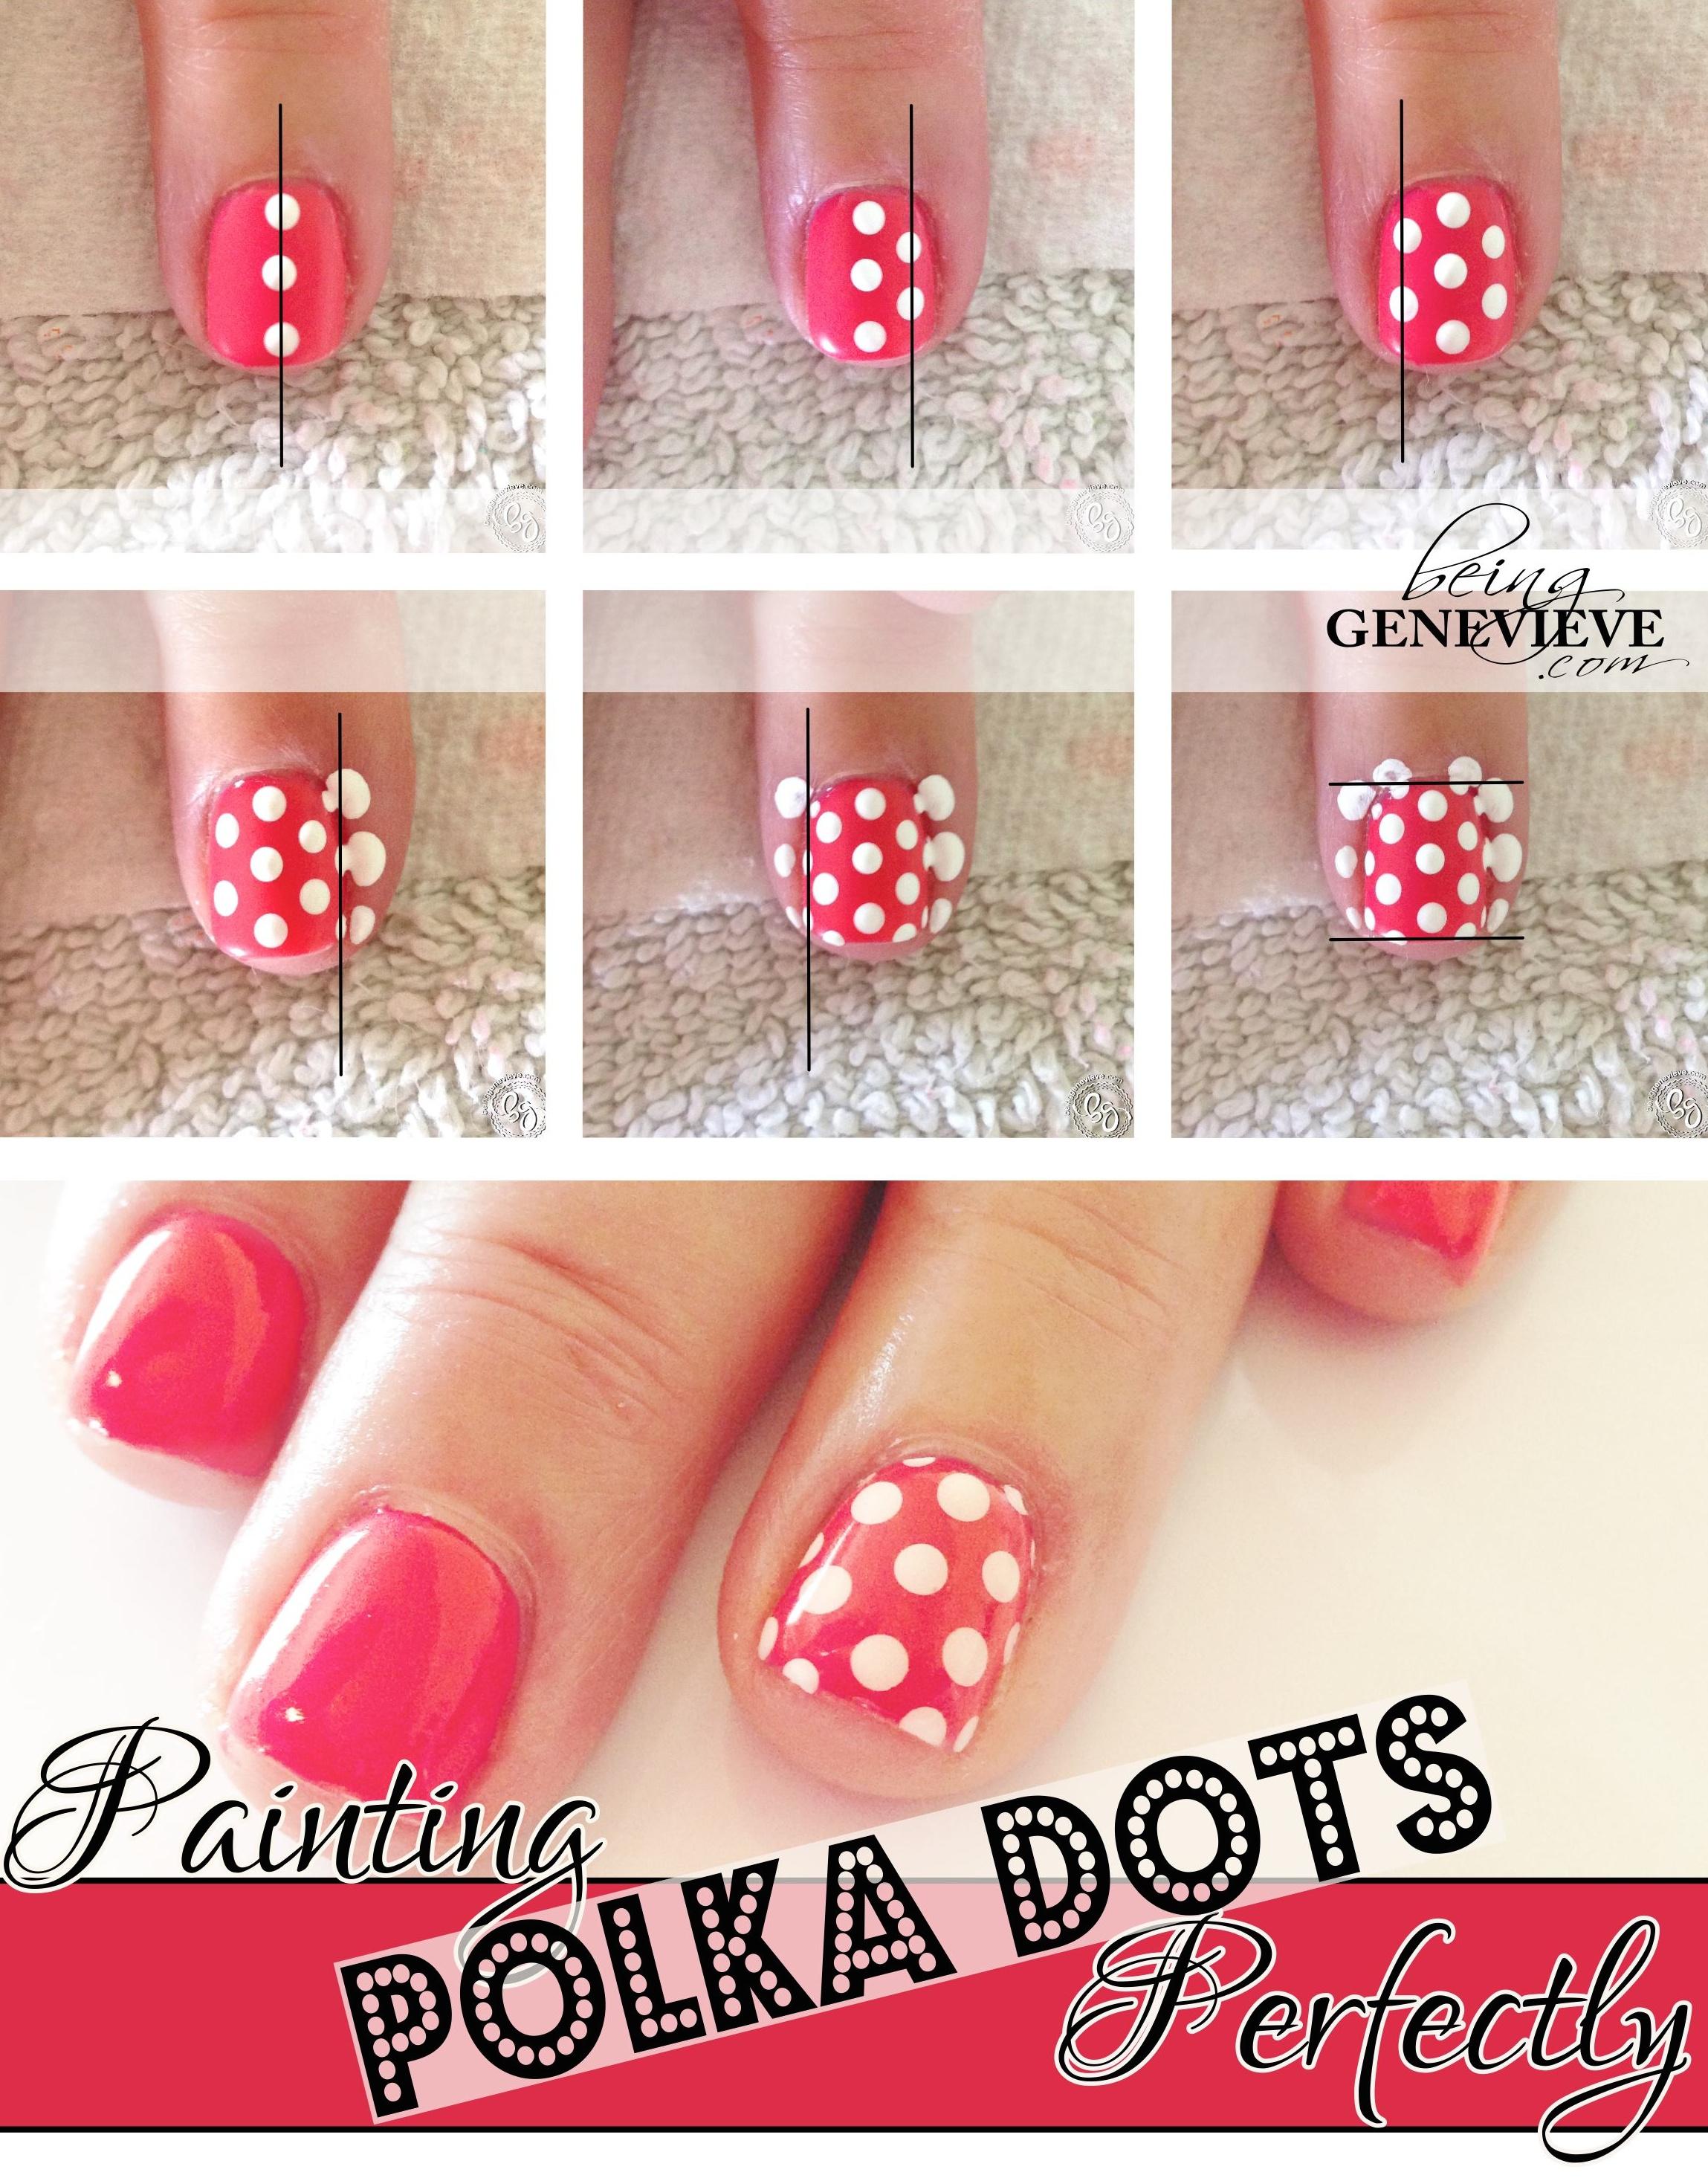 Polka Dots | Being Genevieve